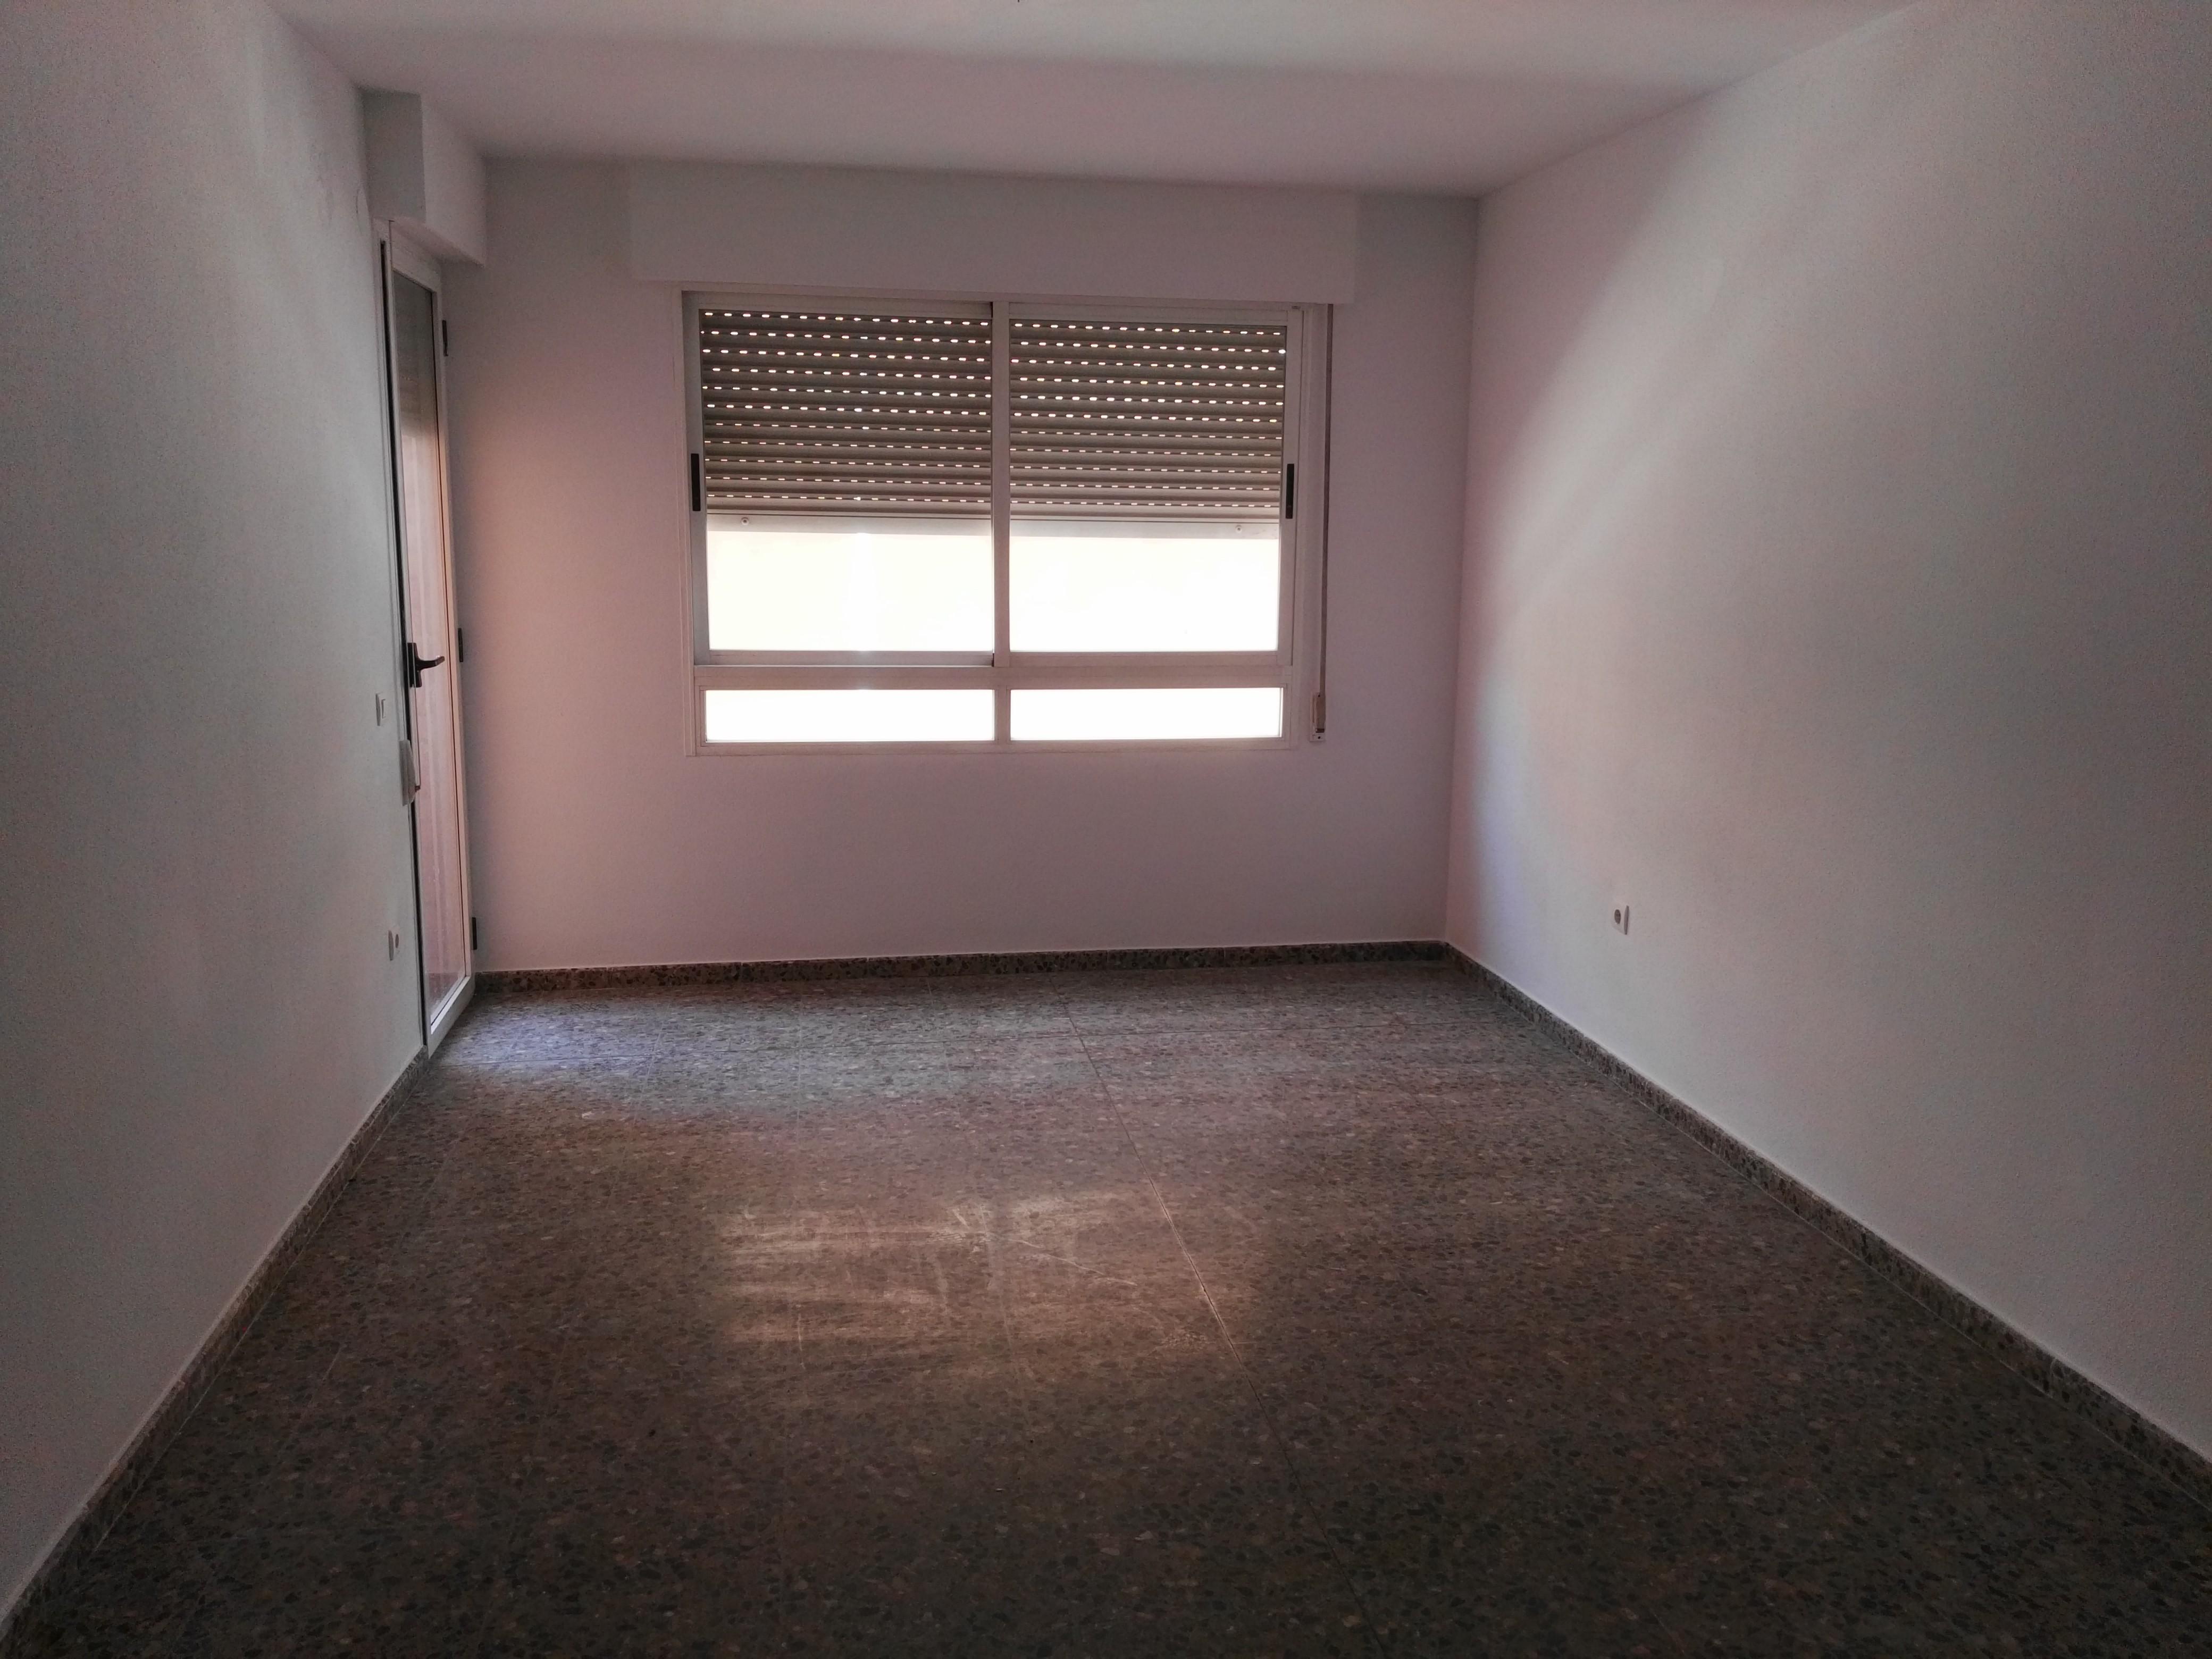 Piso en venta en Premià de Dalt, Barcelona, Calle Torrent de Santa Anna, 131.000 €, 3 habitaciones, 1 baño, 81 m2